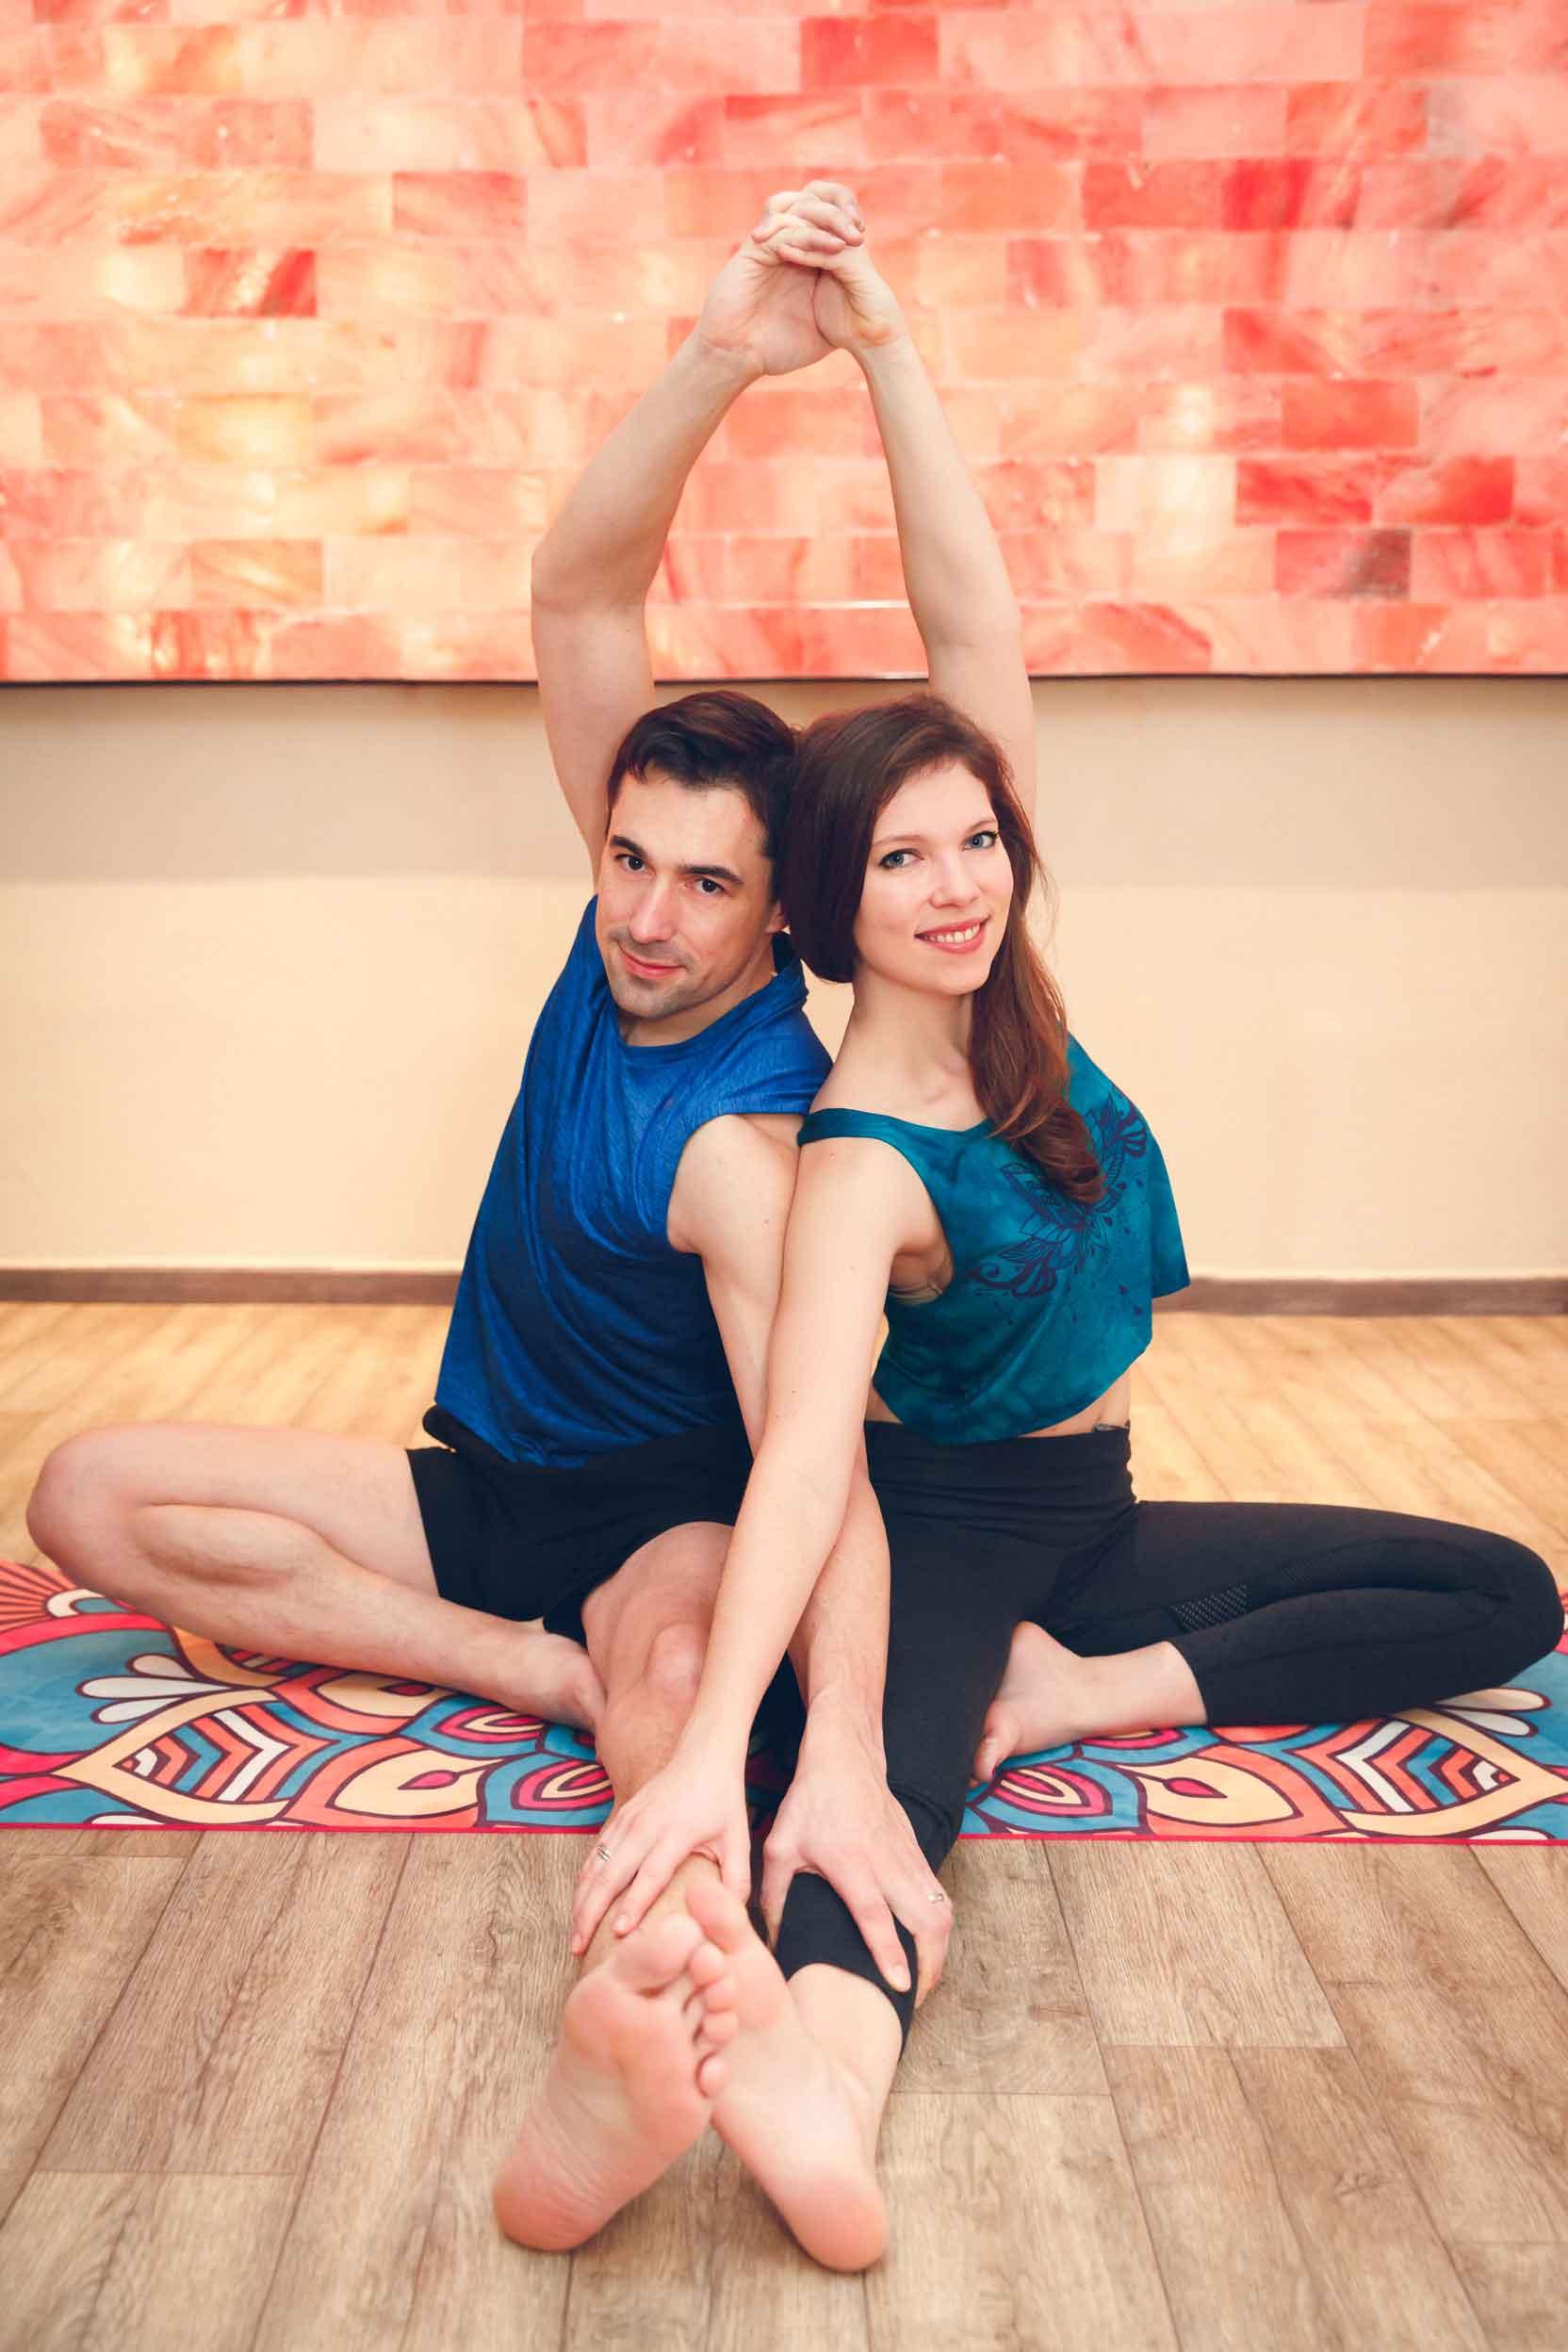 Sportliches Paarshooting im Yogastudio Schwabach IMG 6693w